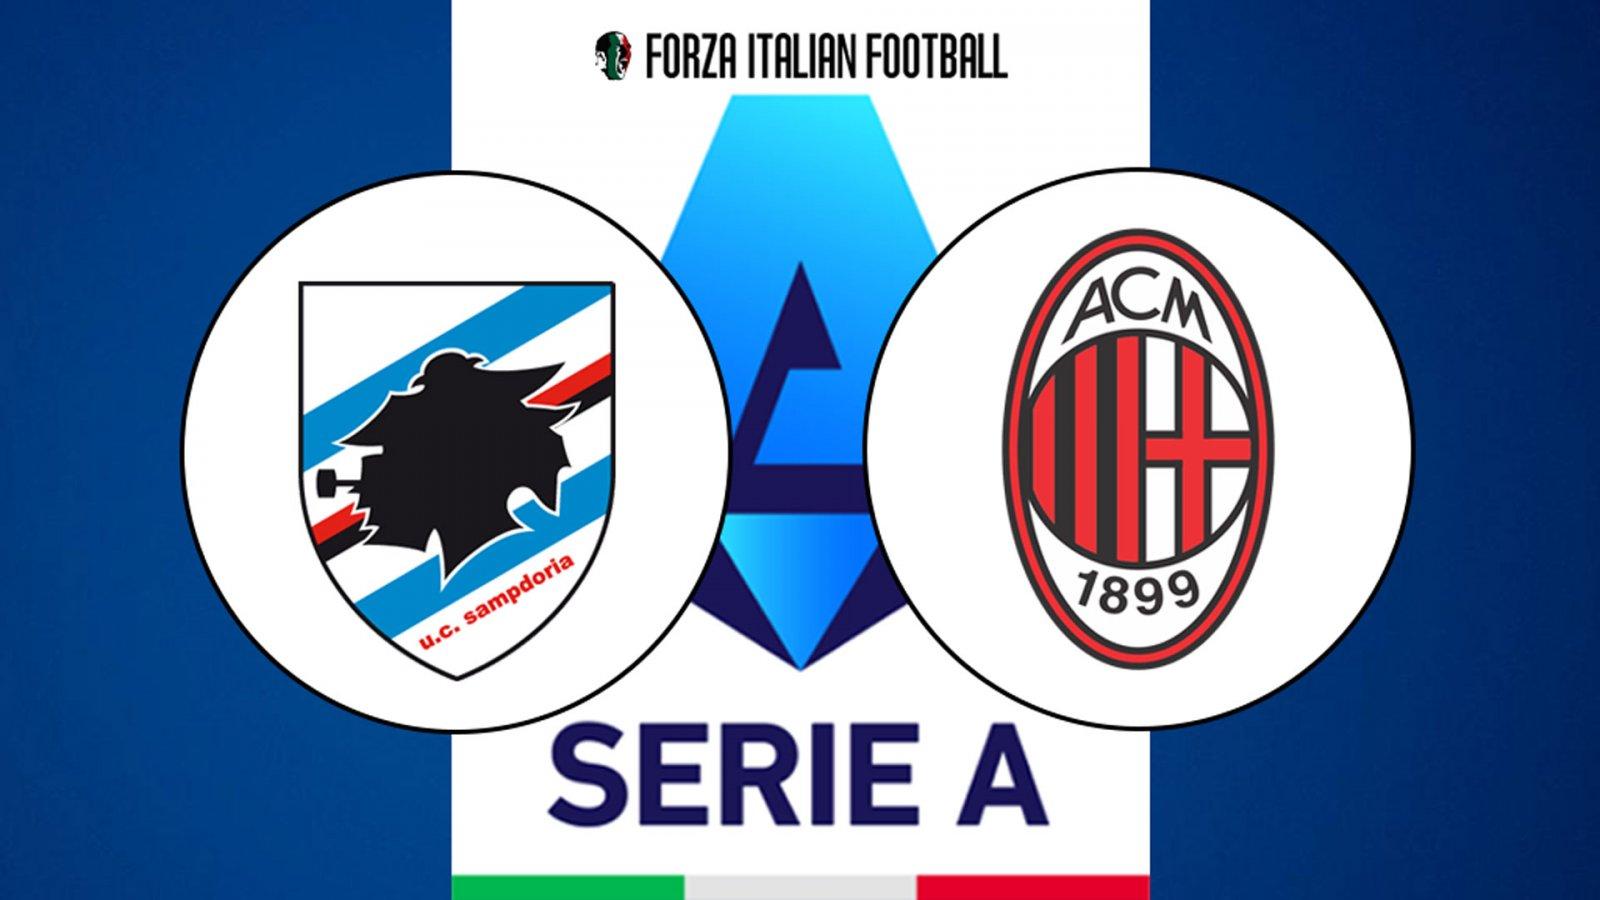 Serie A LIVE – Sampdoria v AC Milan: Probable line-ups, team news and how to watch